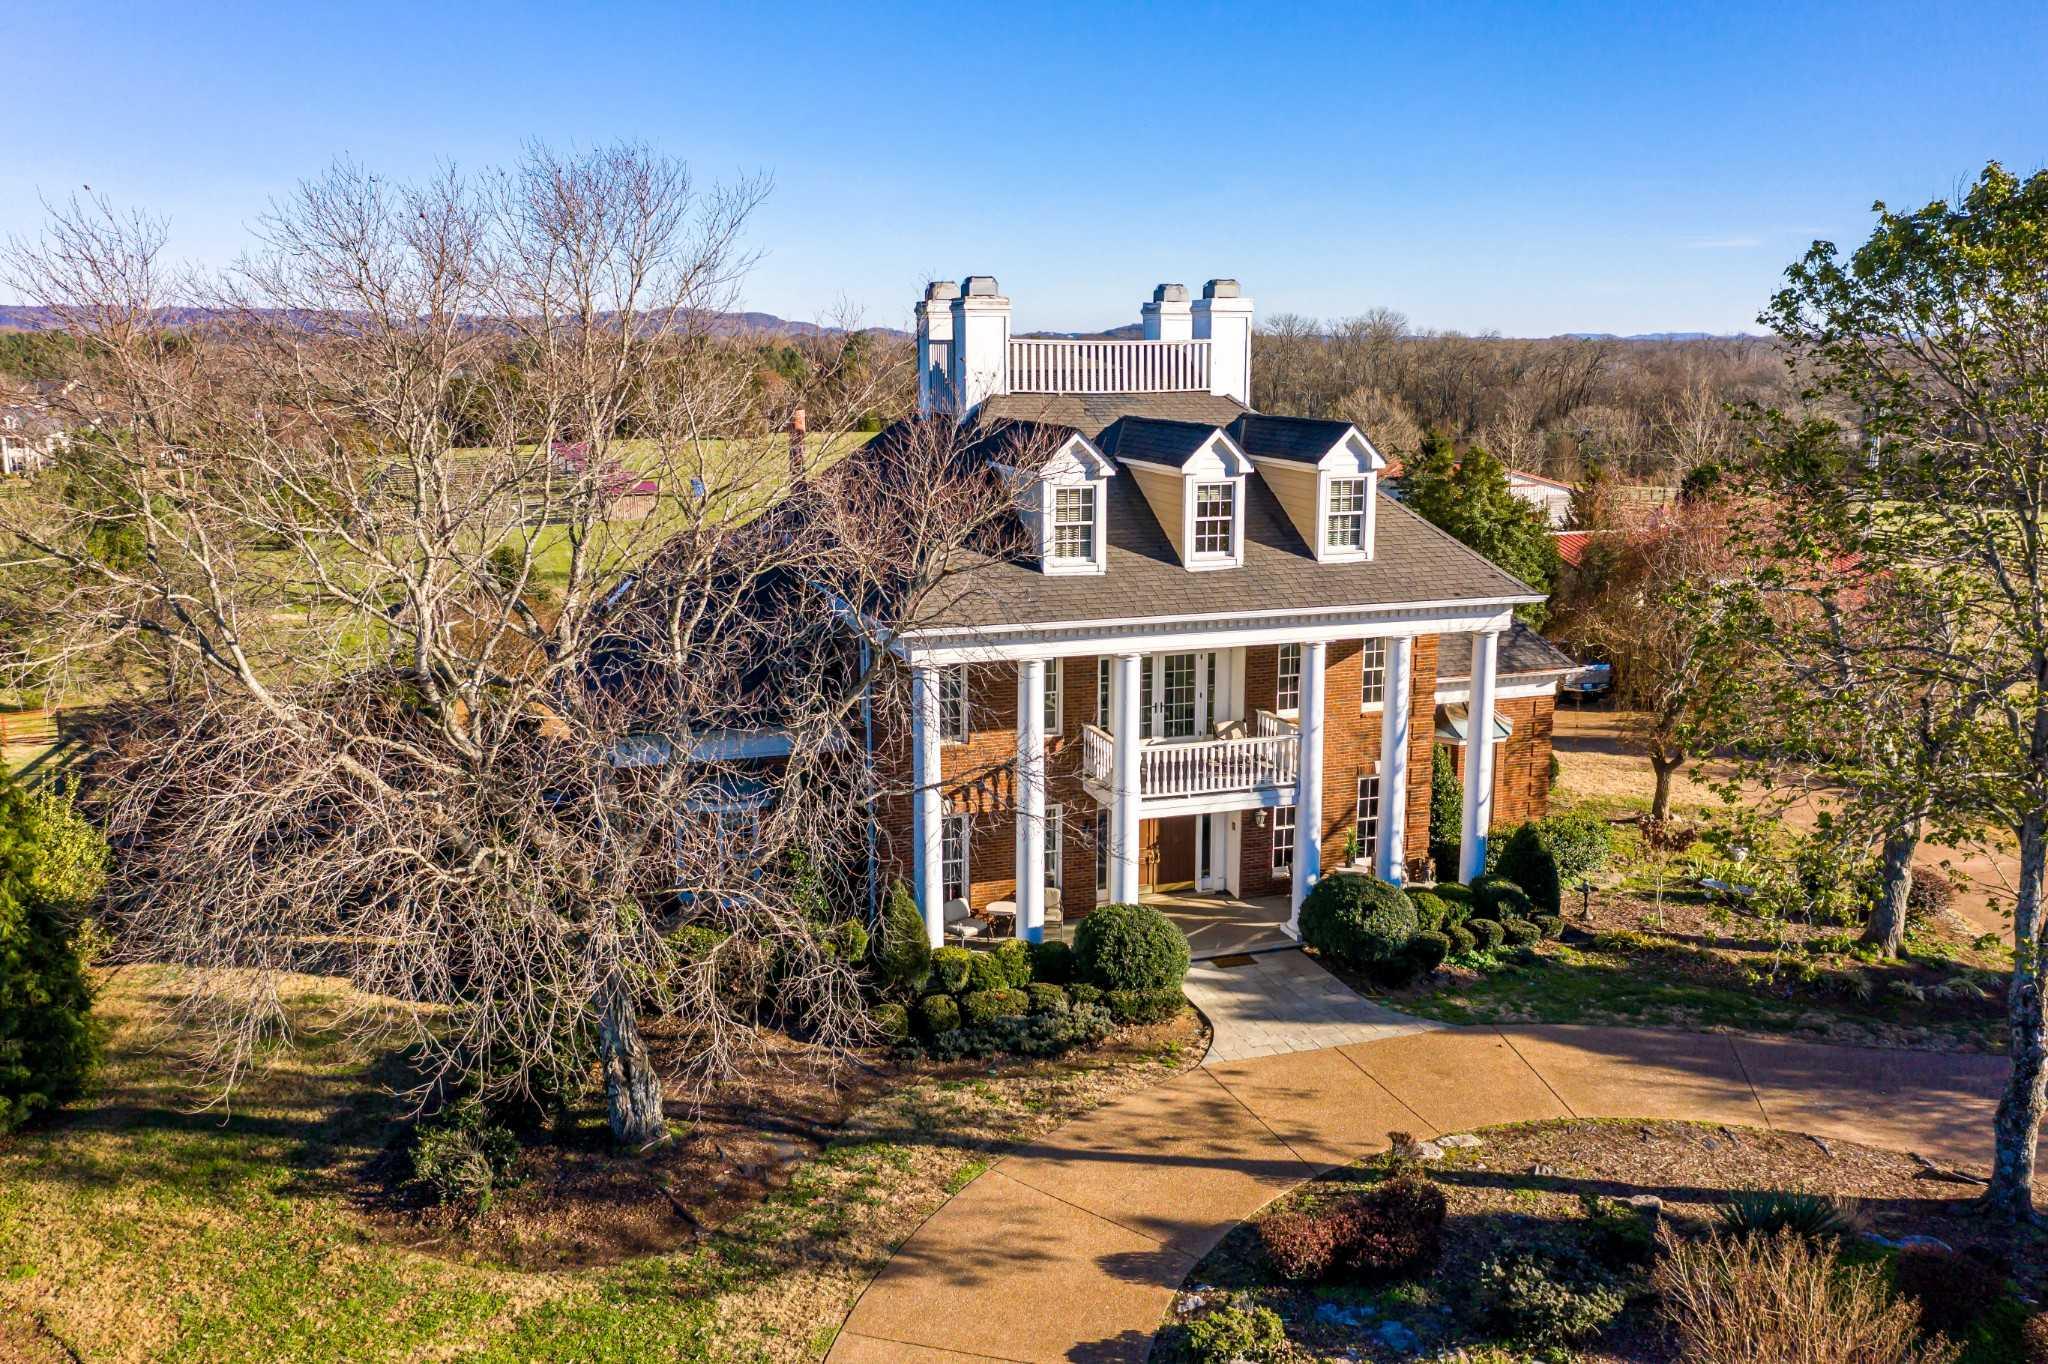 $3,415,000 - 4Br/5Ba -  for Sale in None, Franklin